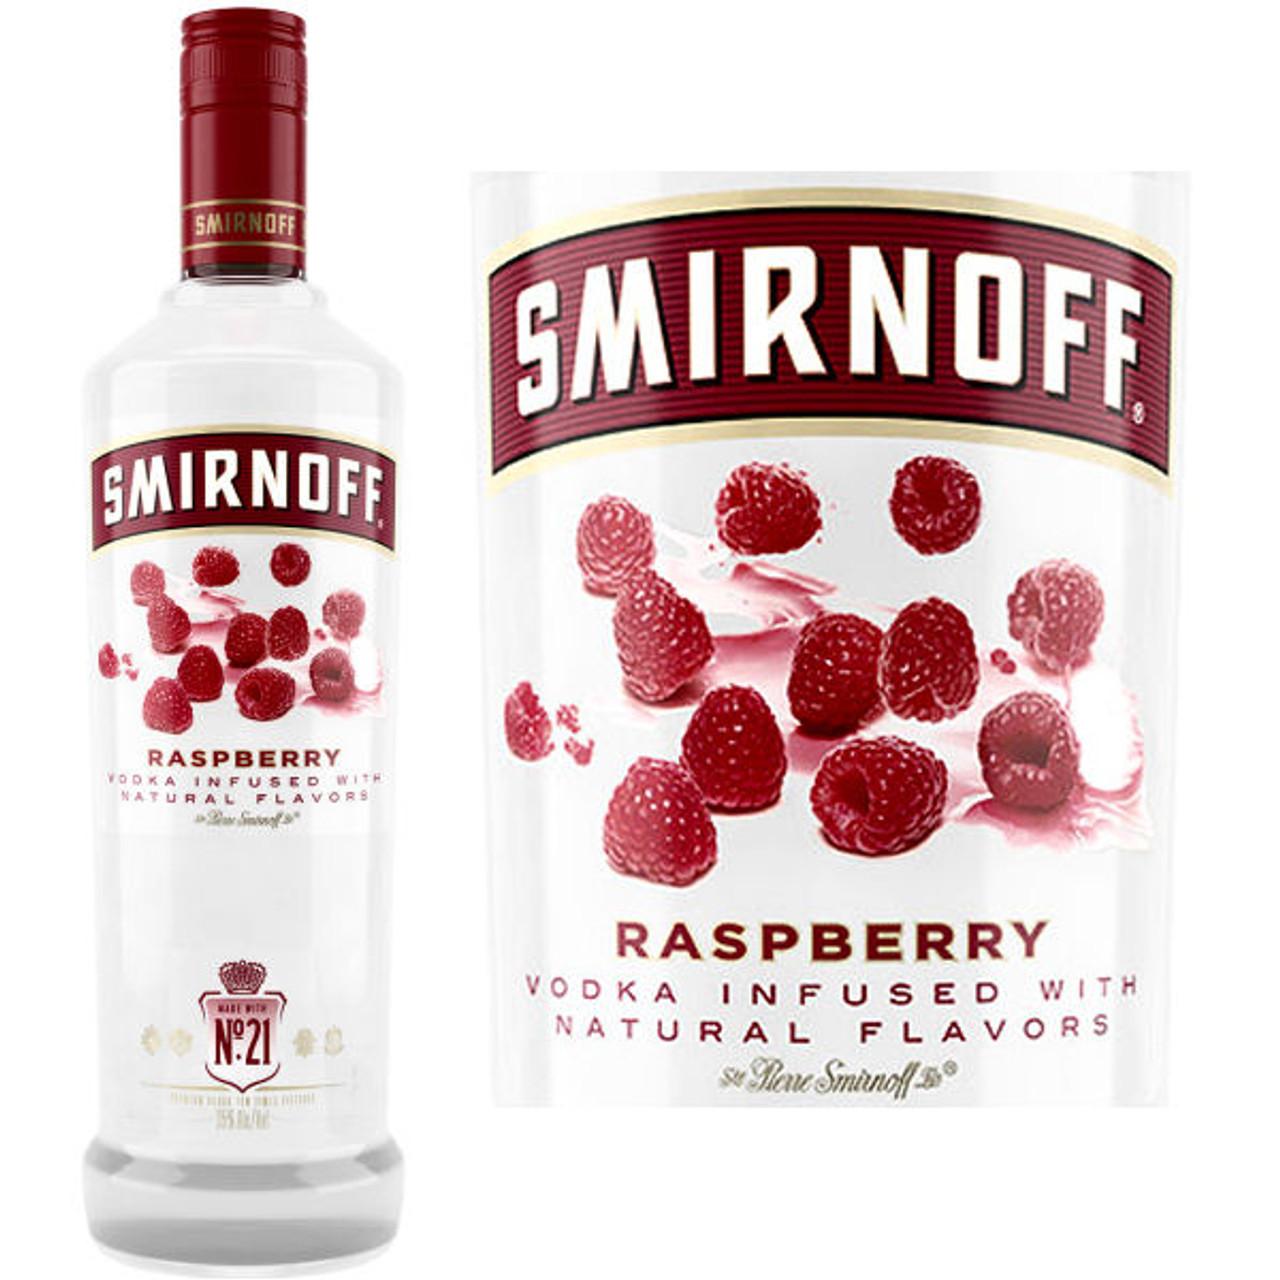 Smirnoff Raspberry Vodka 750ml